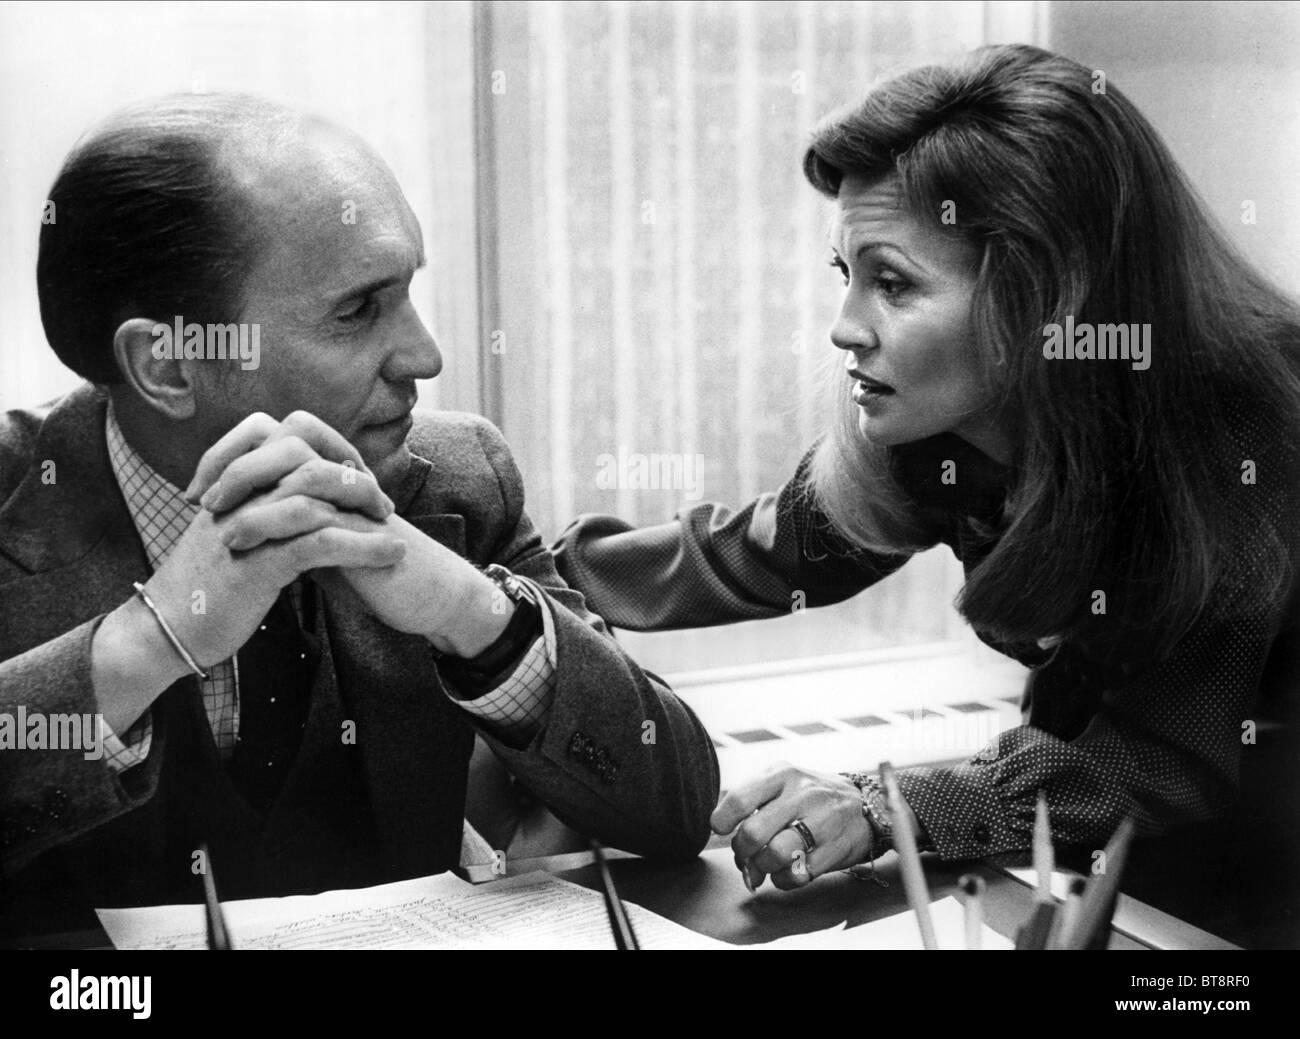 Faye dunaway network - Robert Duvall Faye Dunaway Network 1976